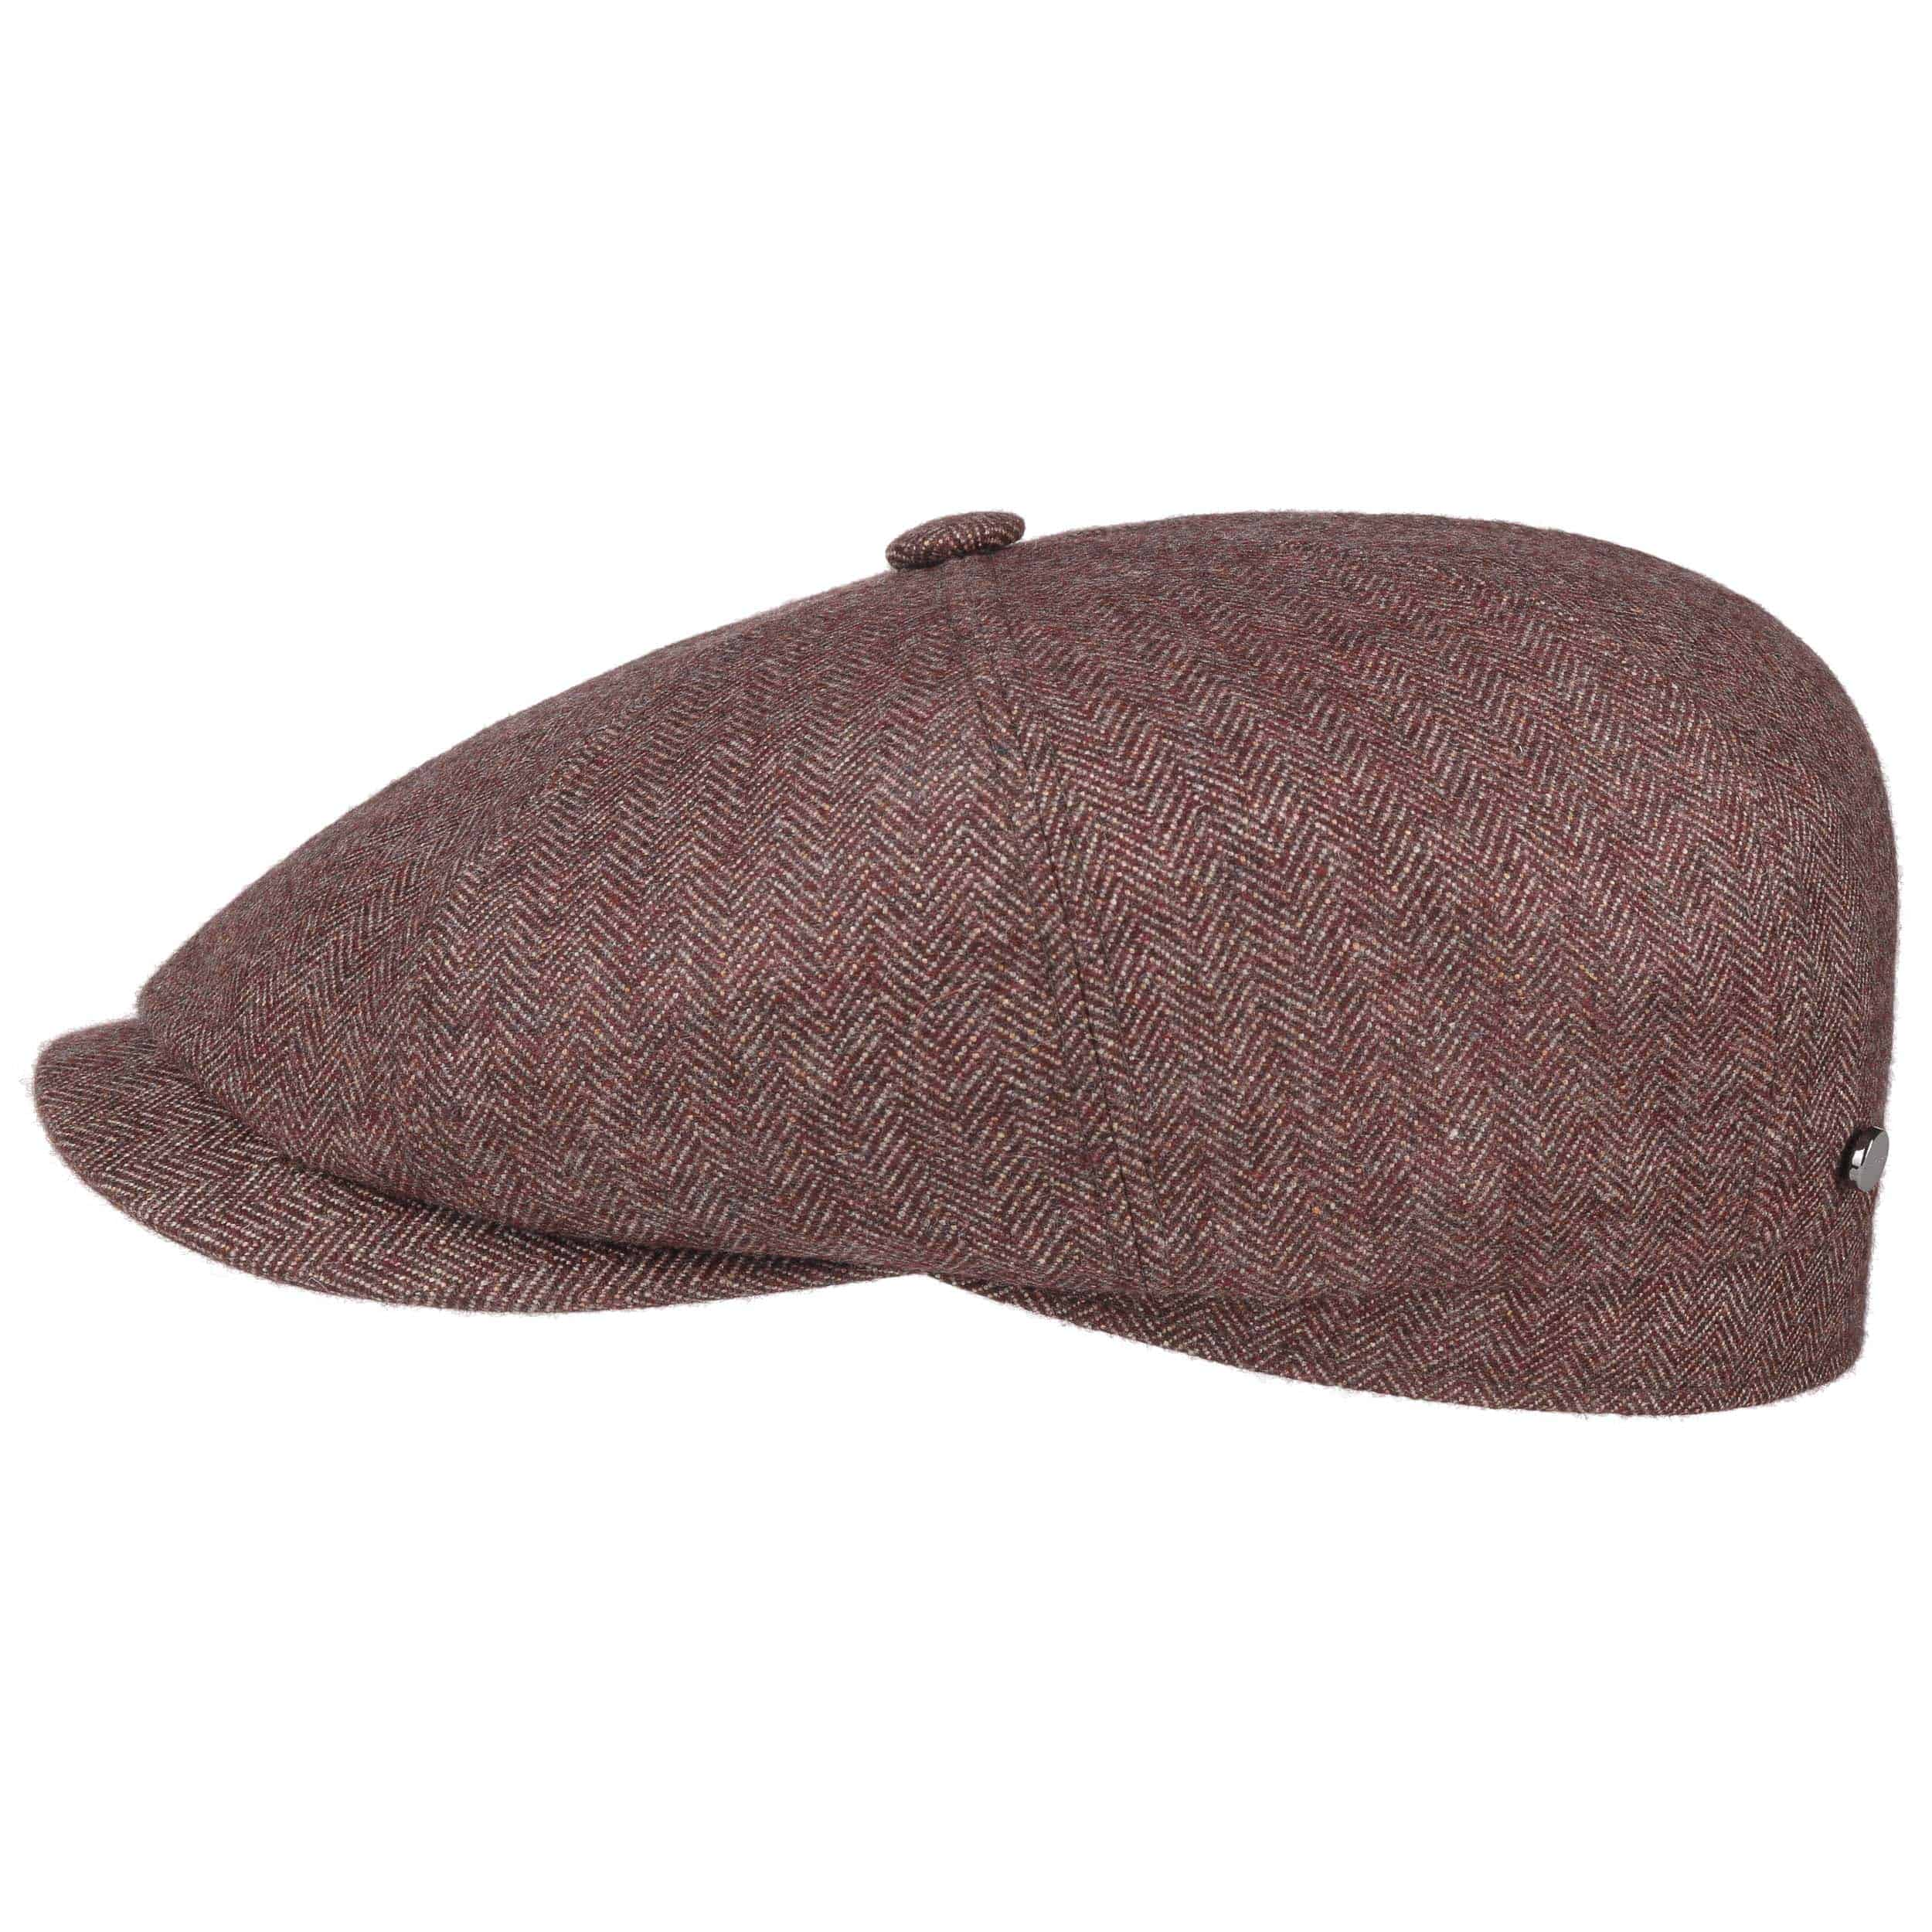 Hatteras Cashmere Silk Flat Cap. by Stetson fda083d99e8c